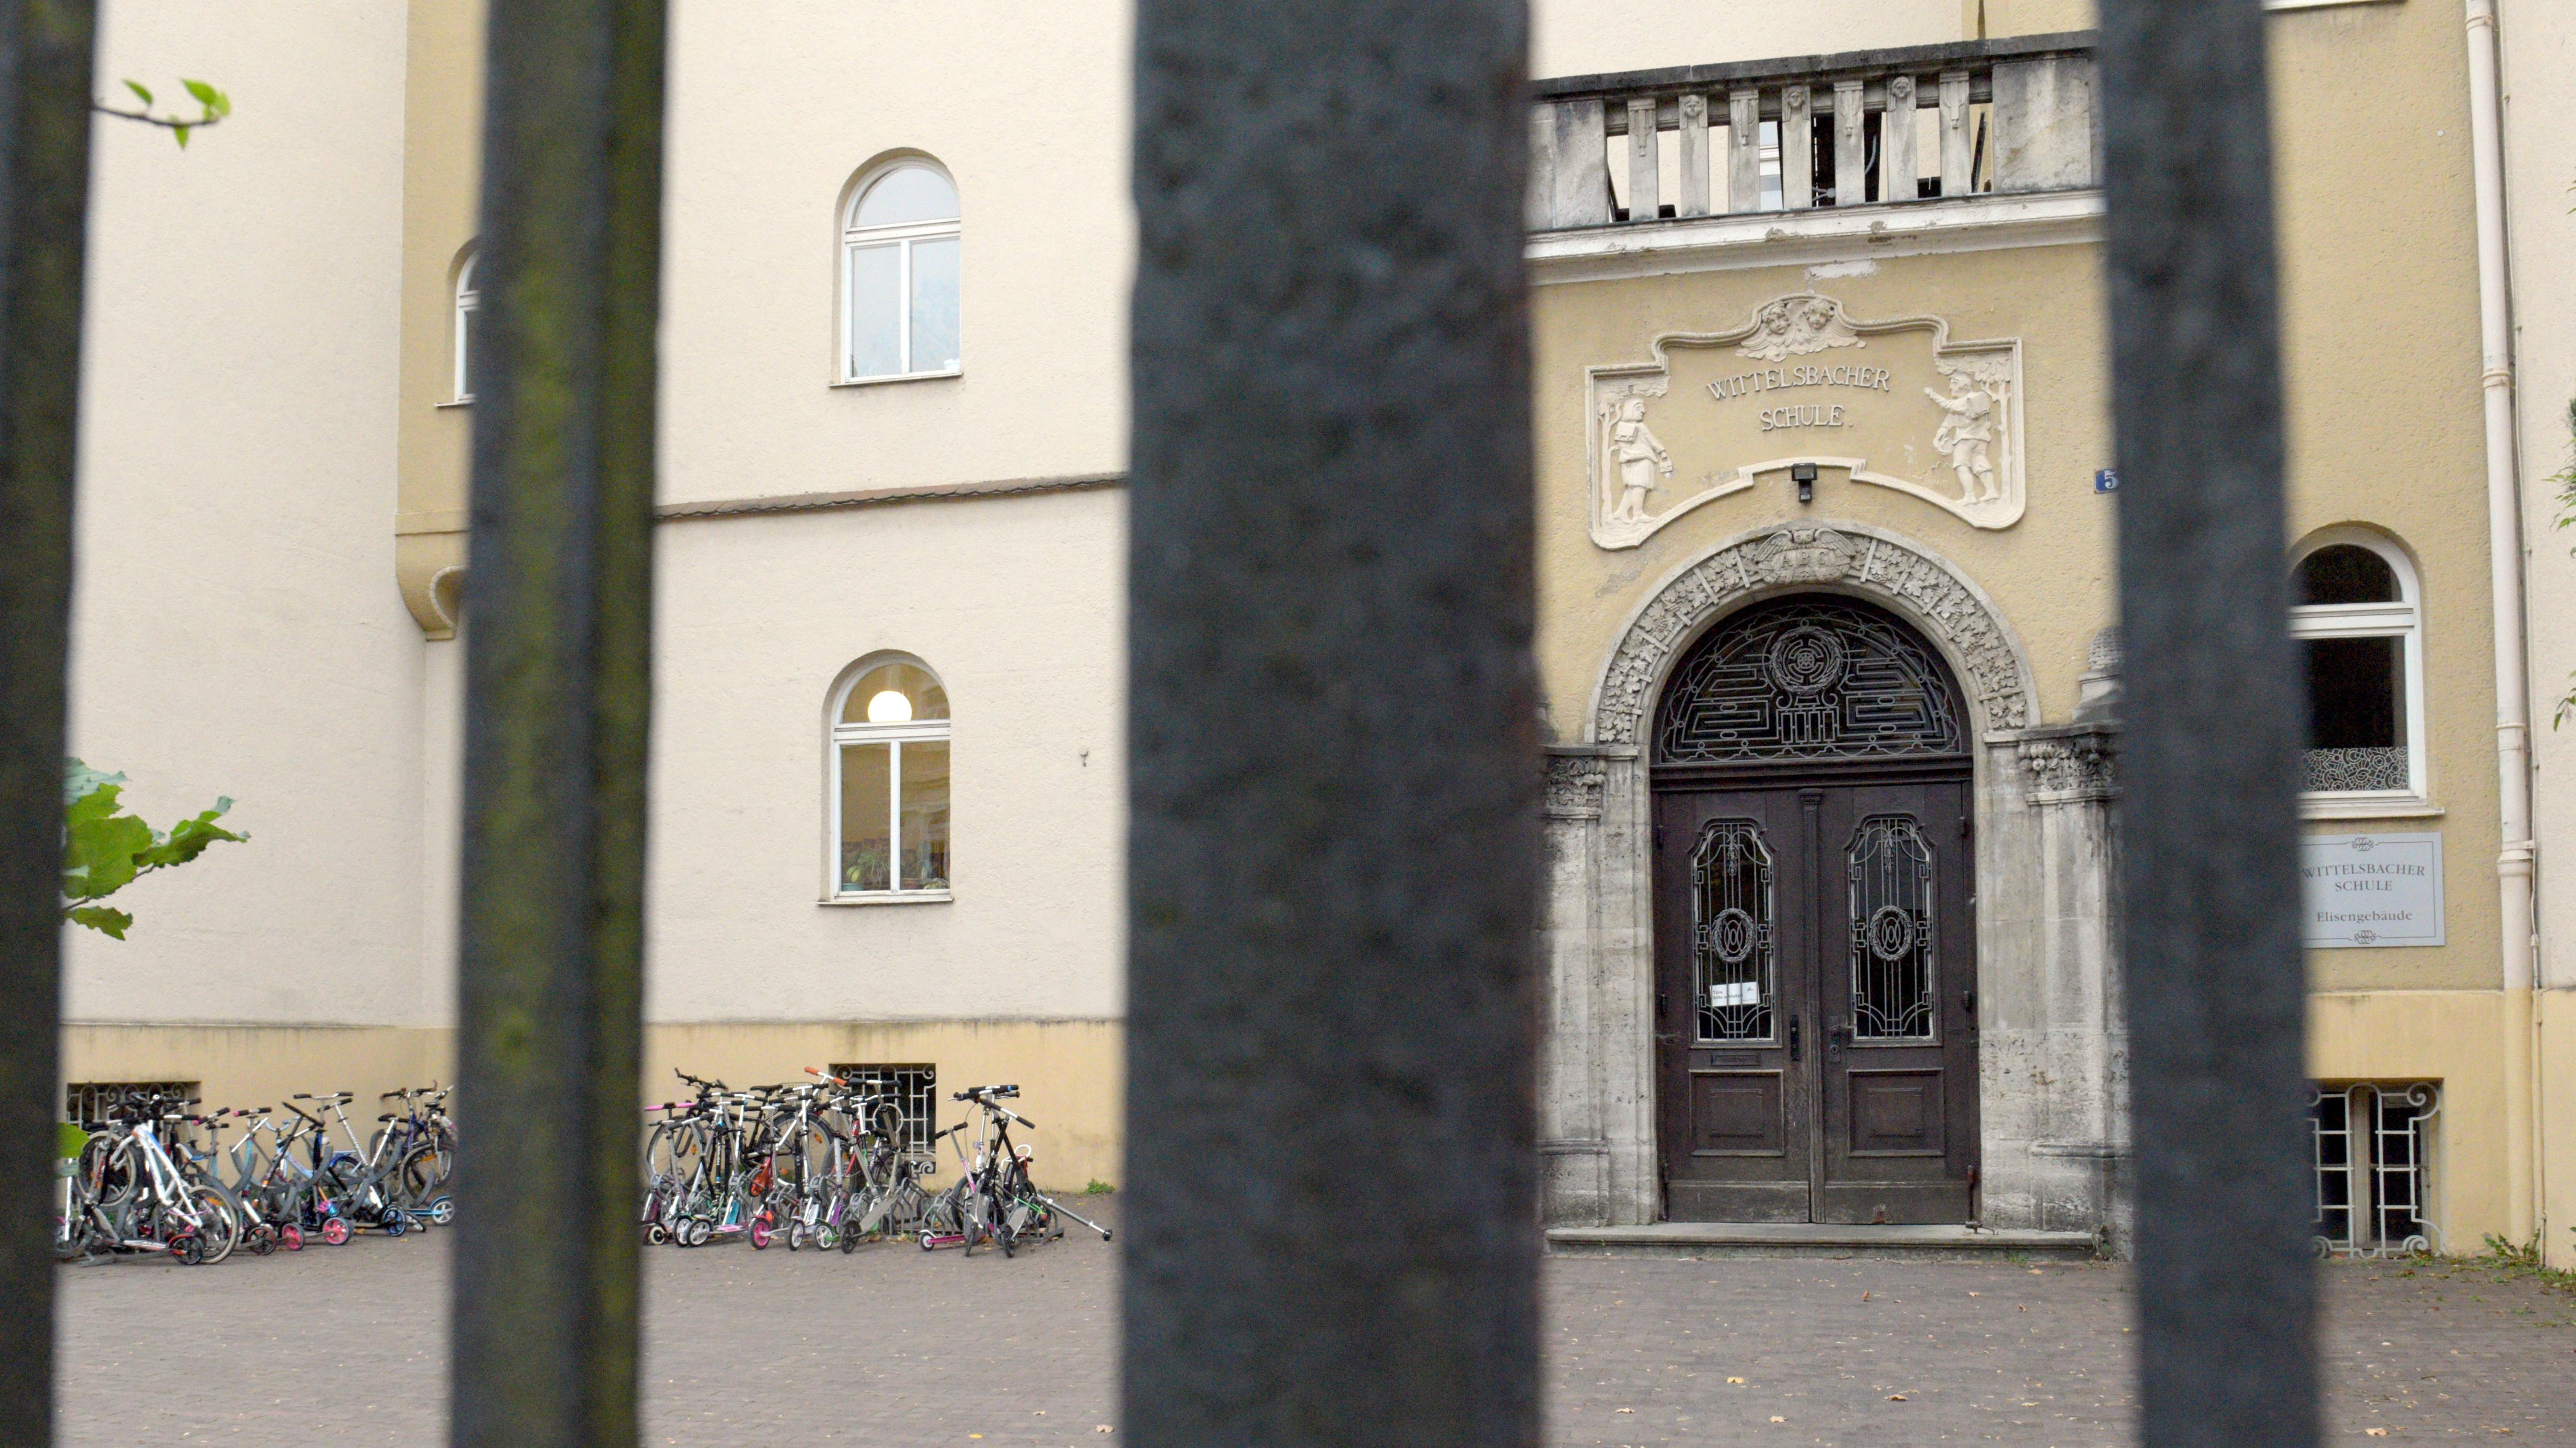 Nach Missbrauch: Augsburg will Schulen umzäunen